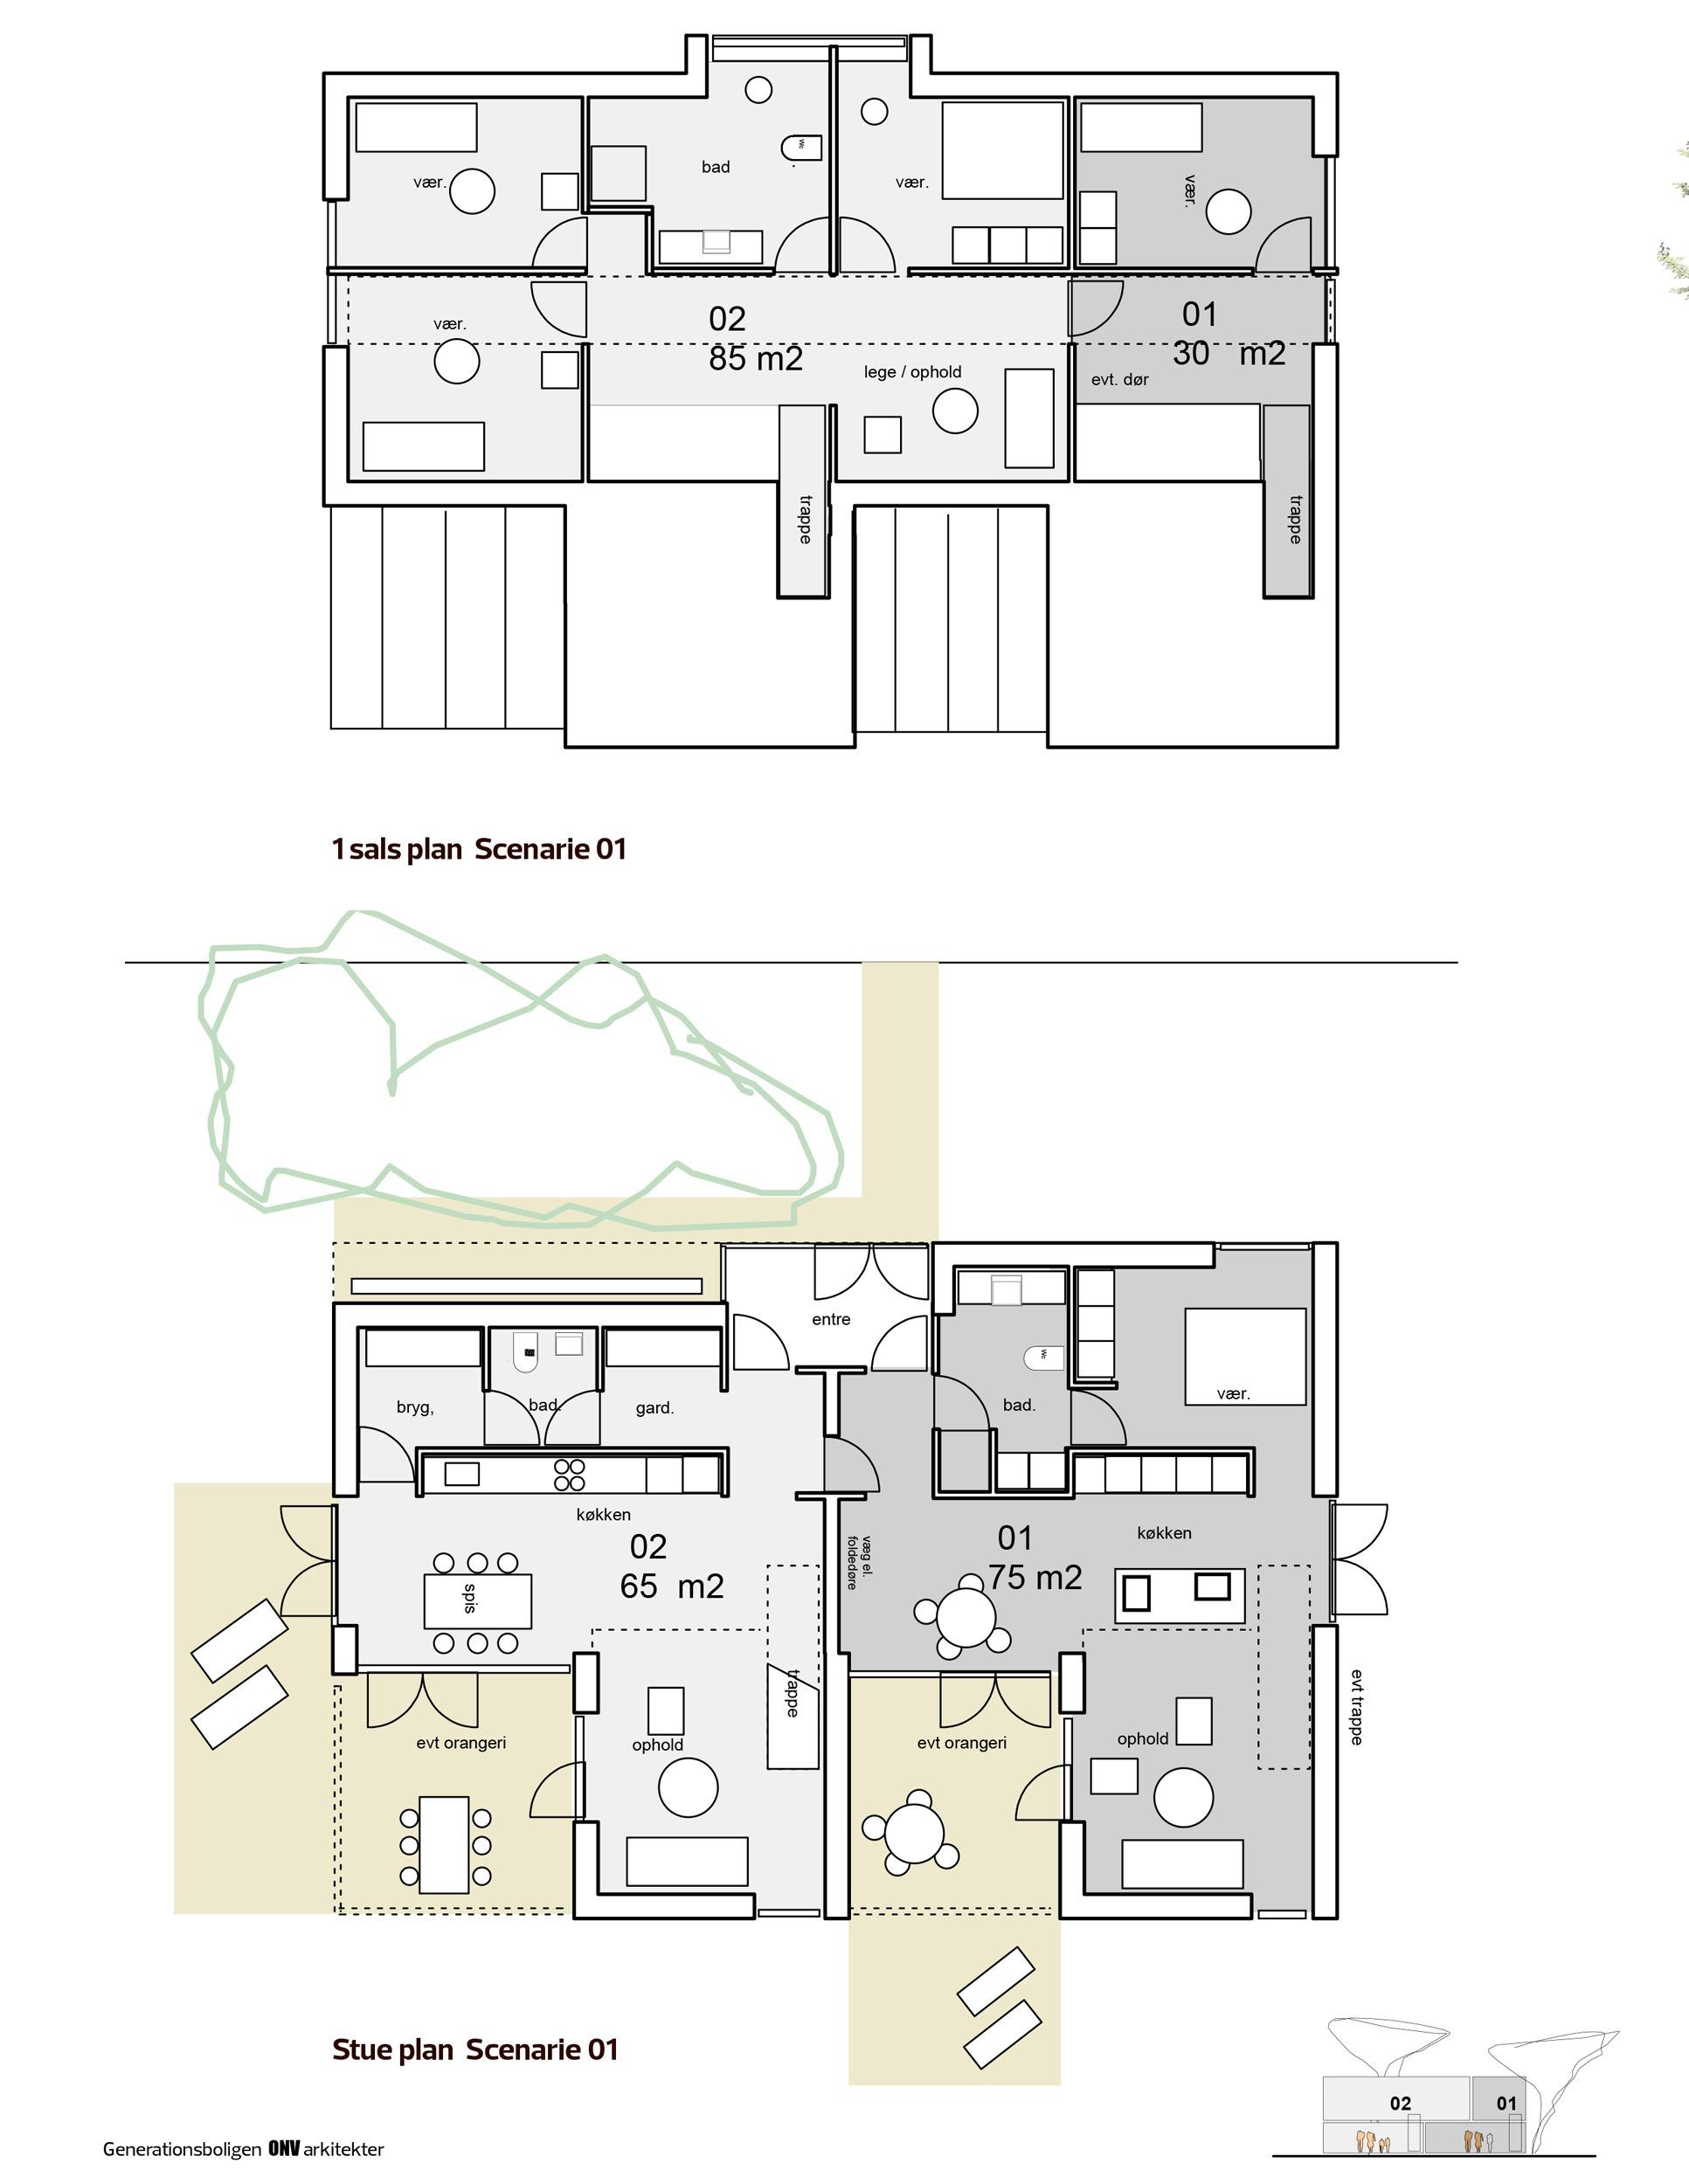 Generationsboligen-typehus-det-fleksible-hus-ONV-arkitekter-02